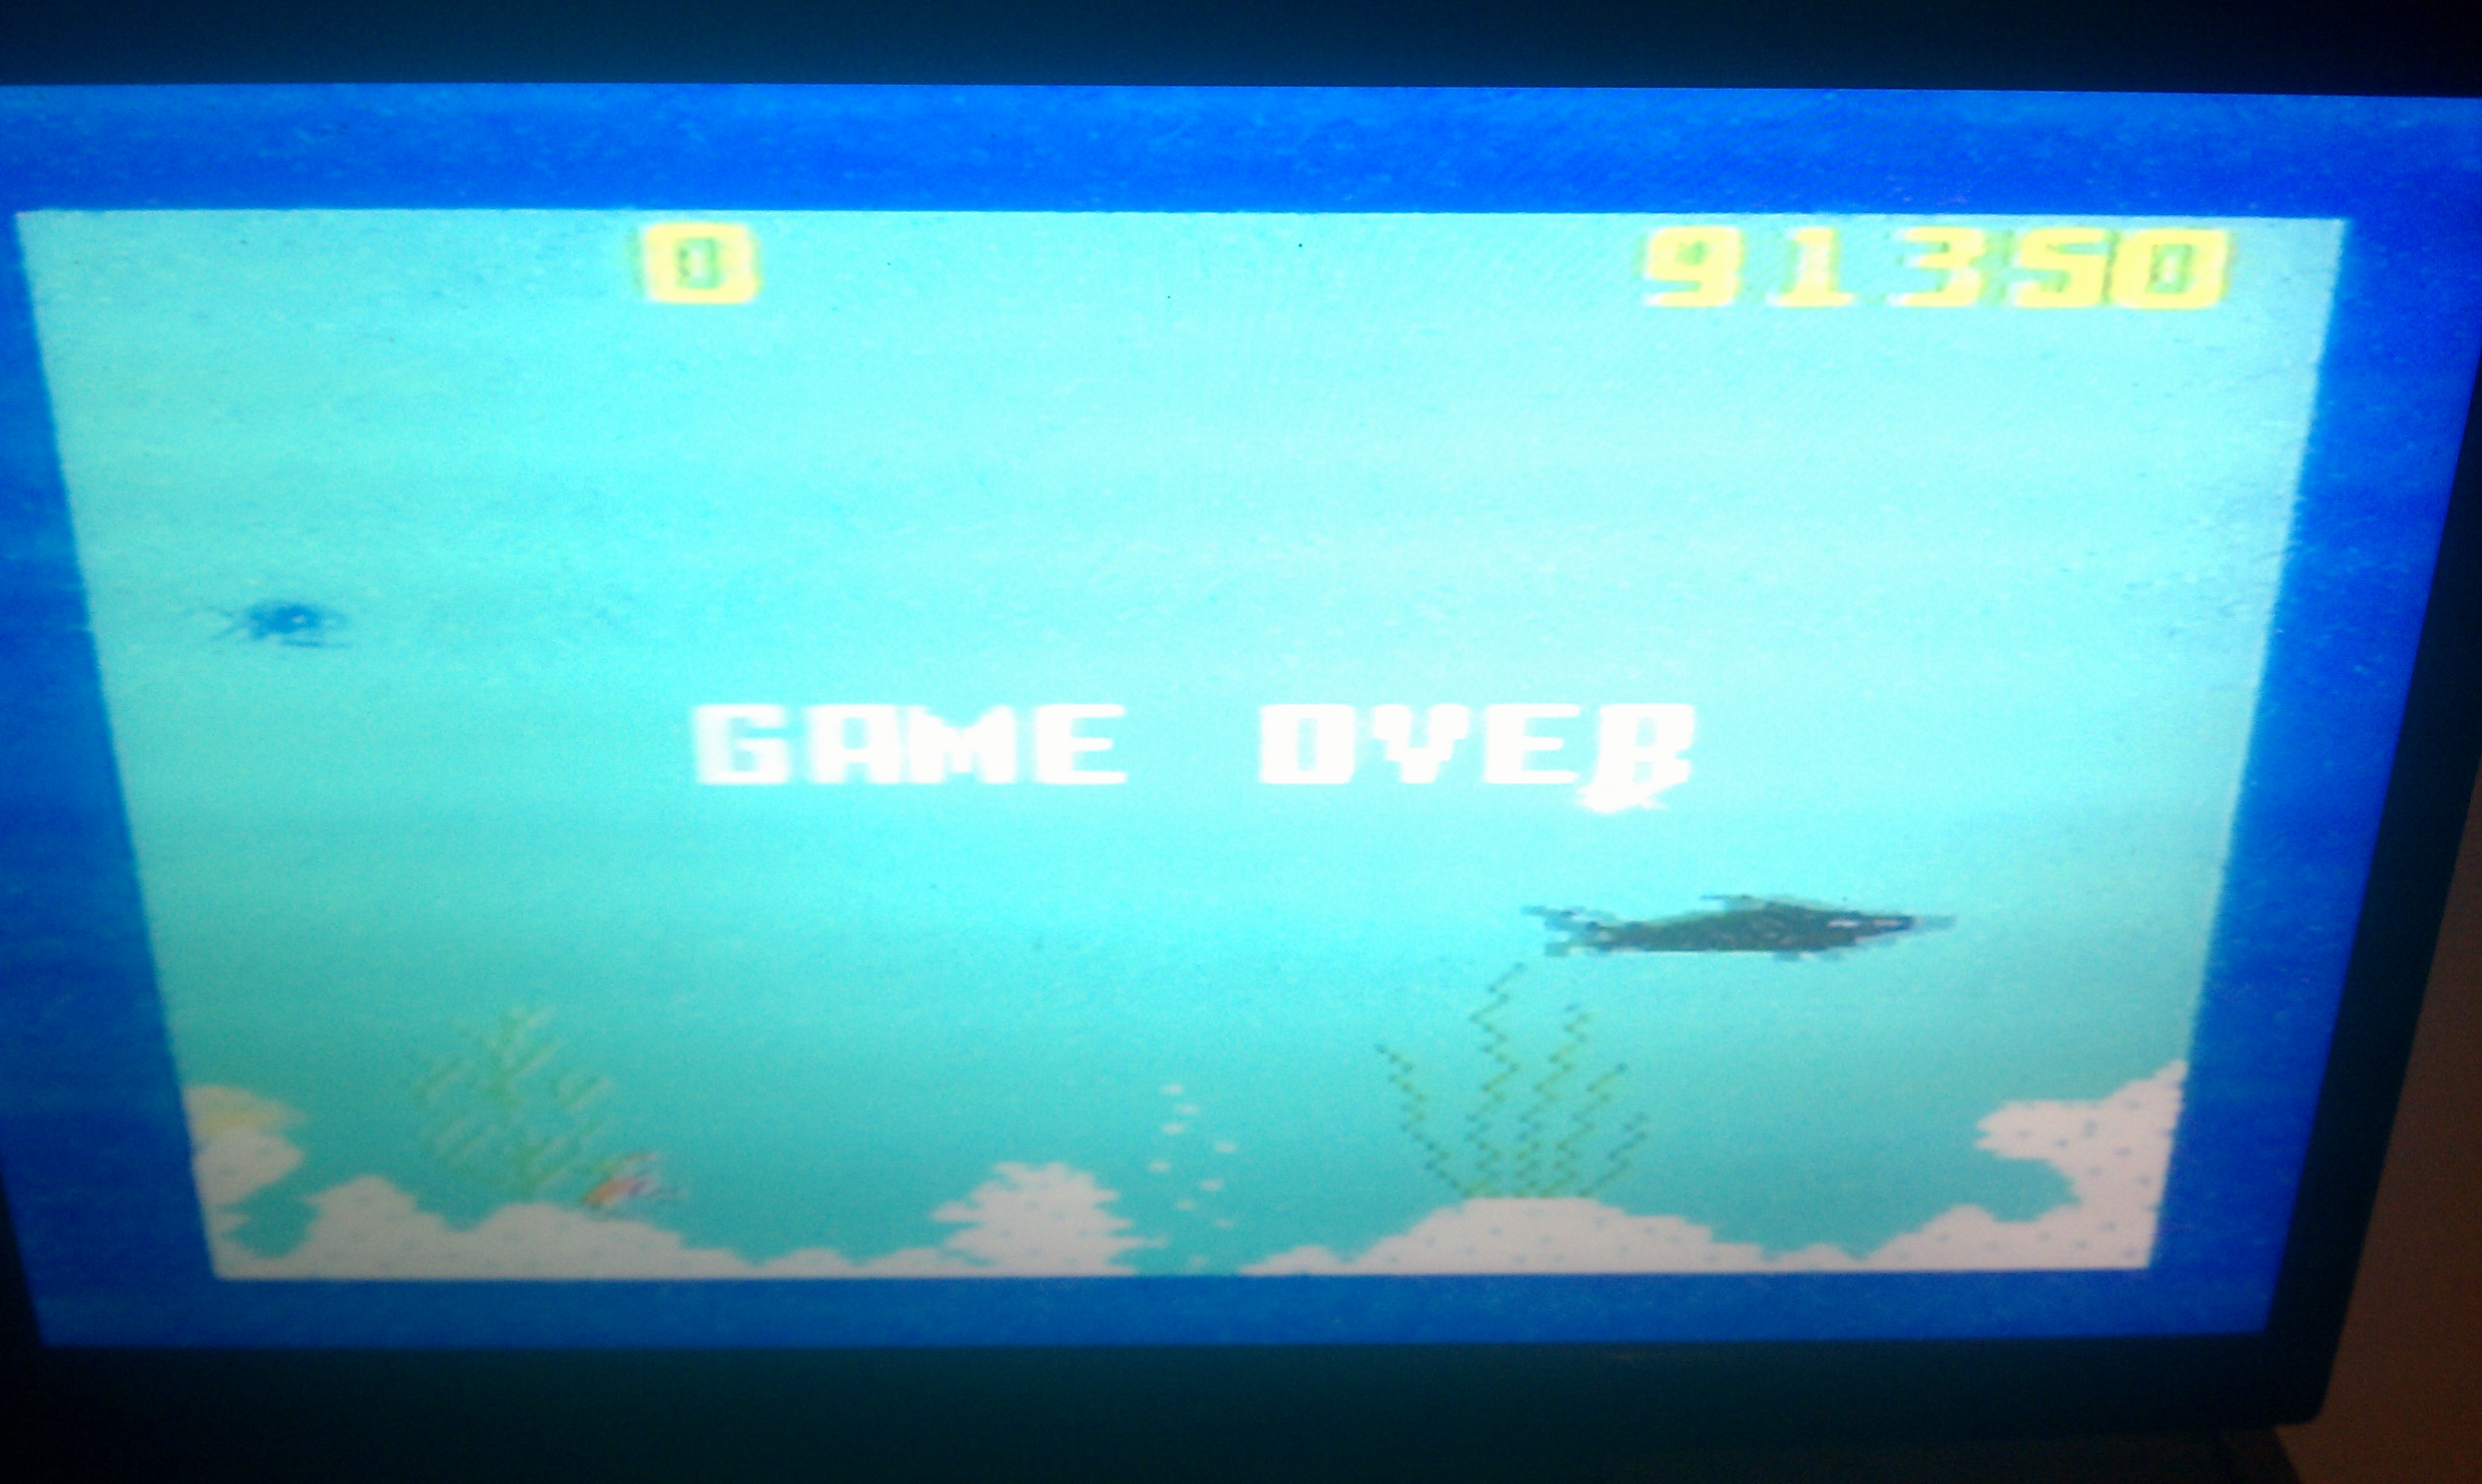 S.BAZ: Shark! Shark!: Normal Mode (Intellivision) 91,350 points on 2020-08-05 18:38:03